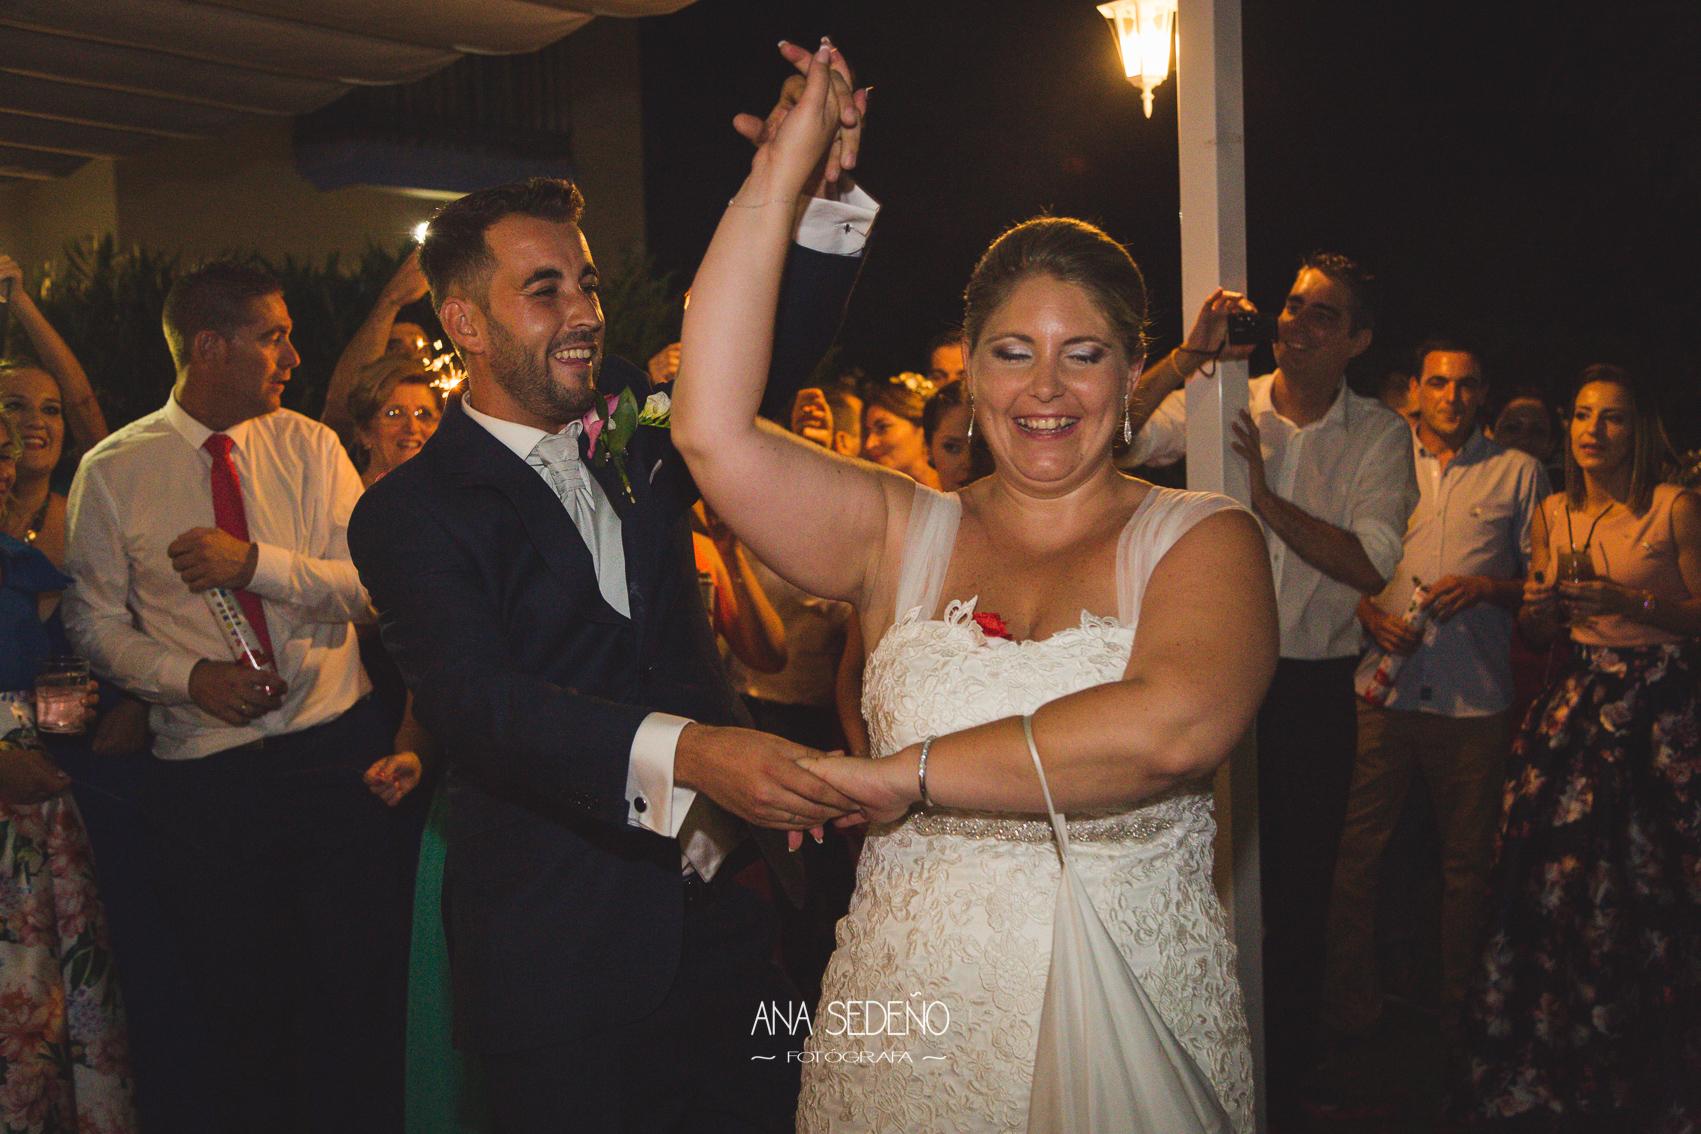 Ana Sedeño Fotografa.-Boda A&V2178